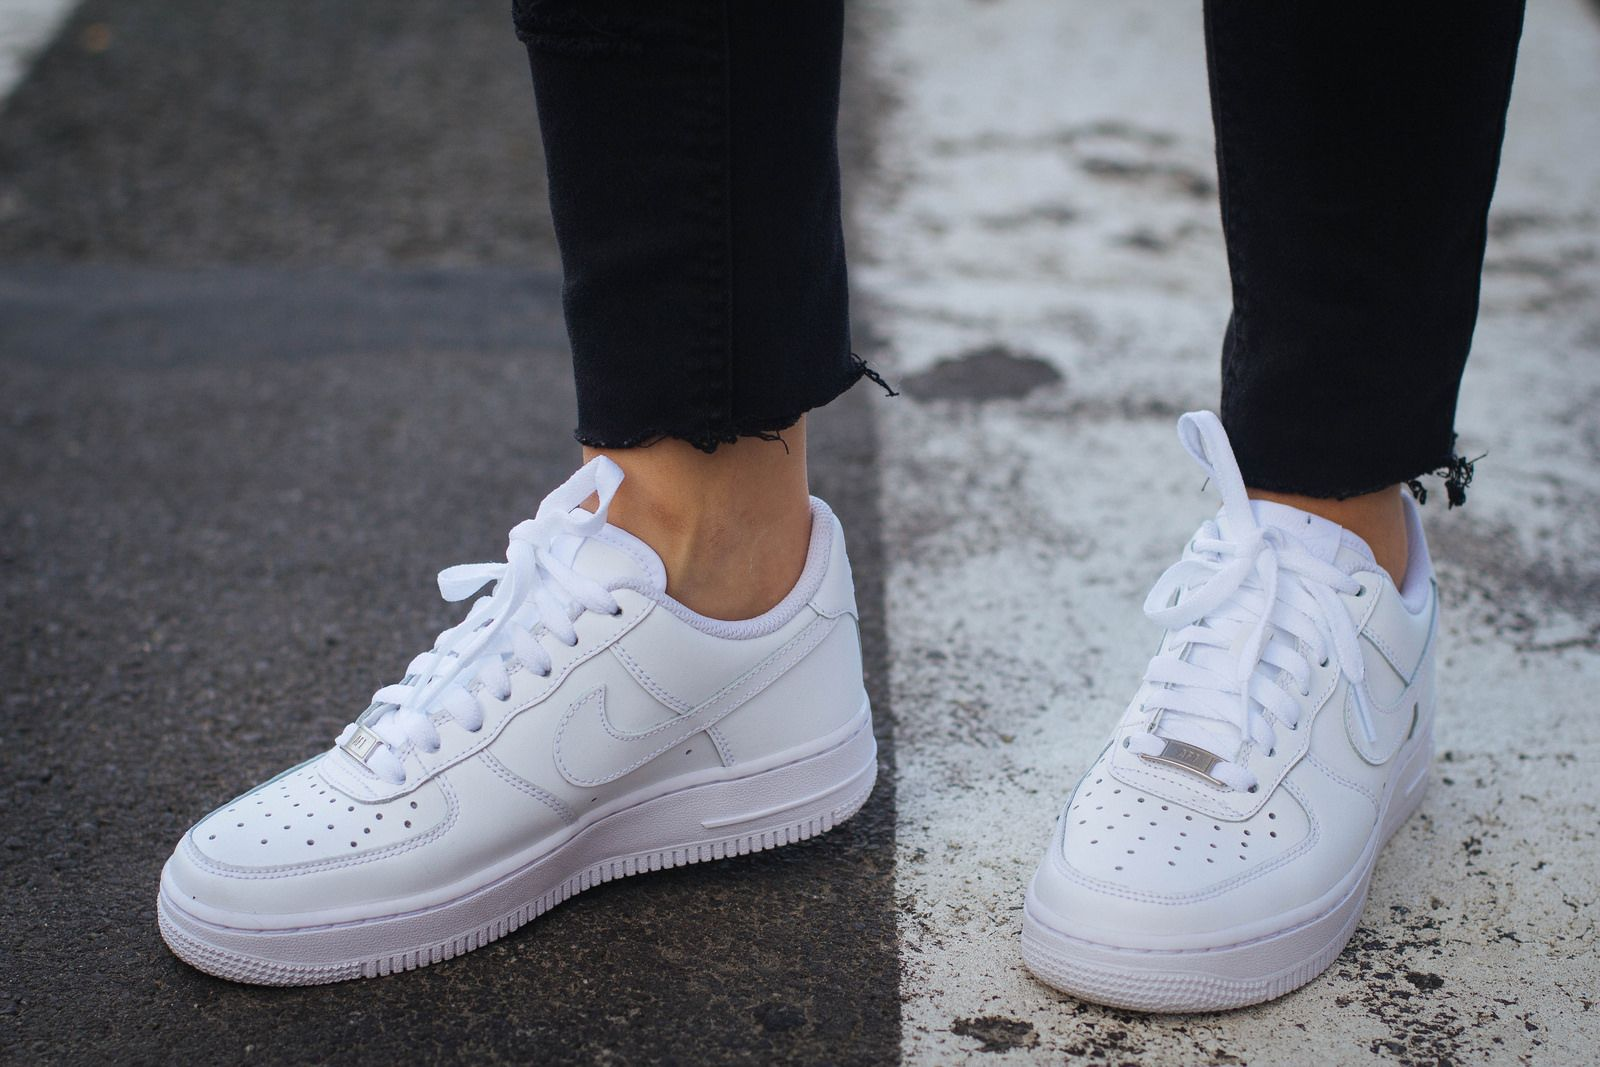 Air Heels Feminine Mode ForceOn High Que J'adore Nike drxBoeCW